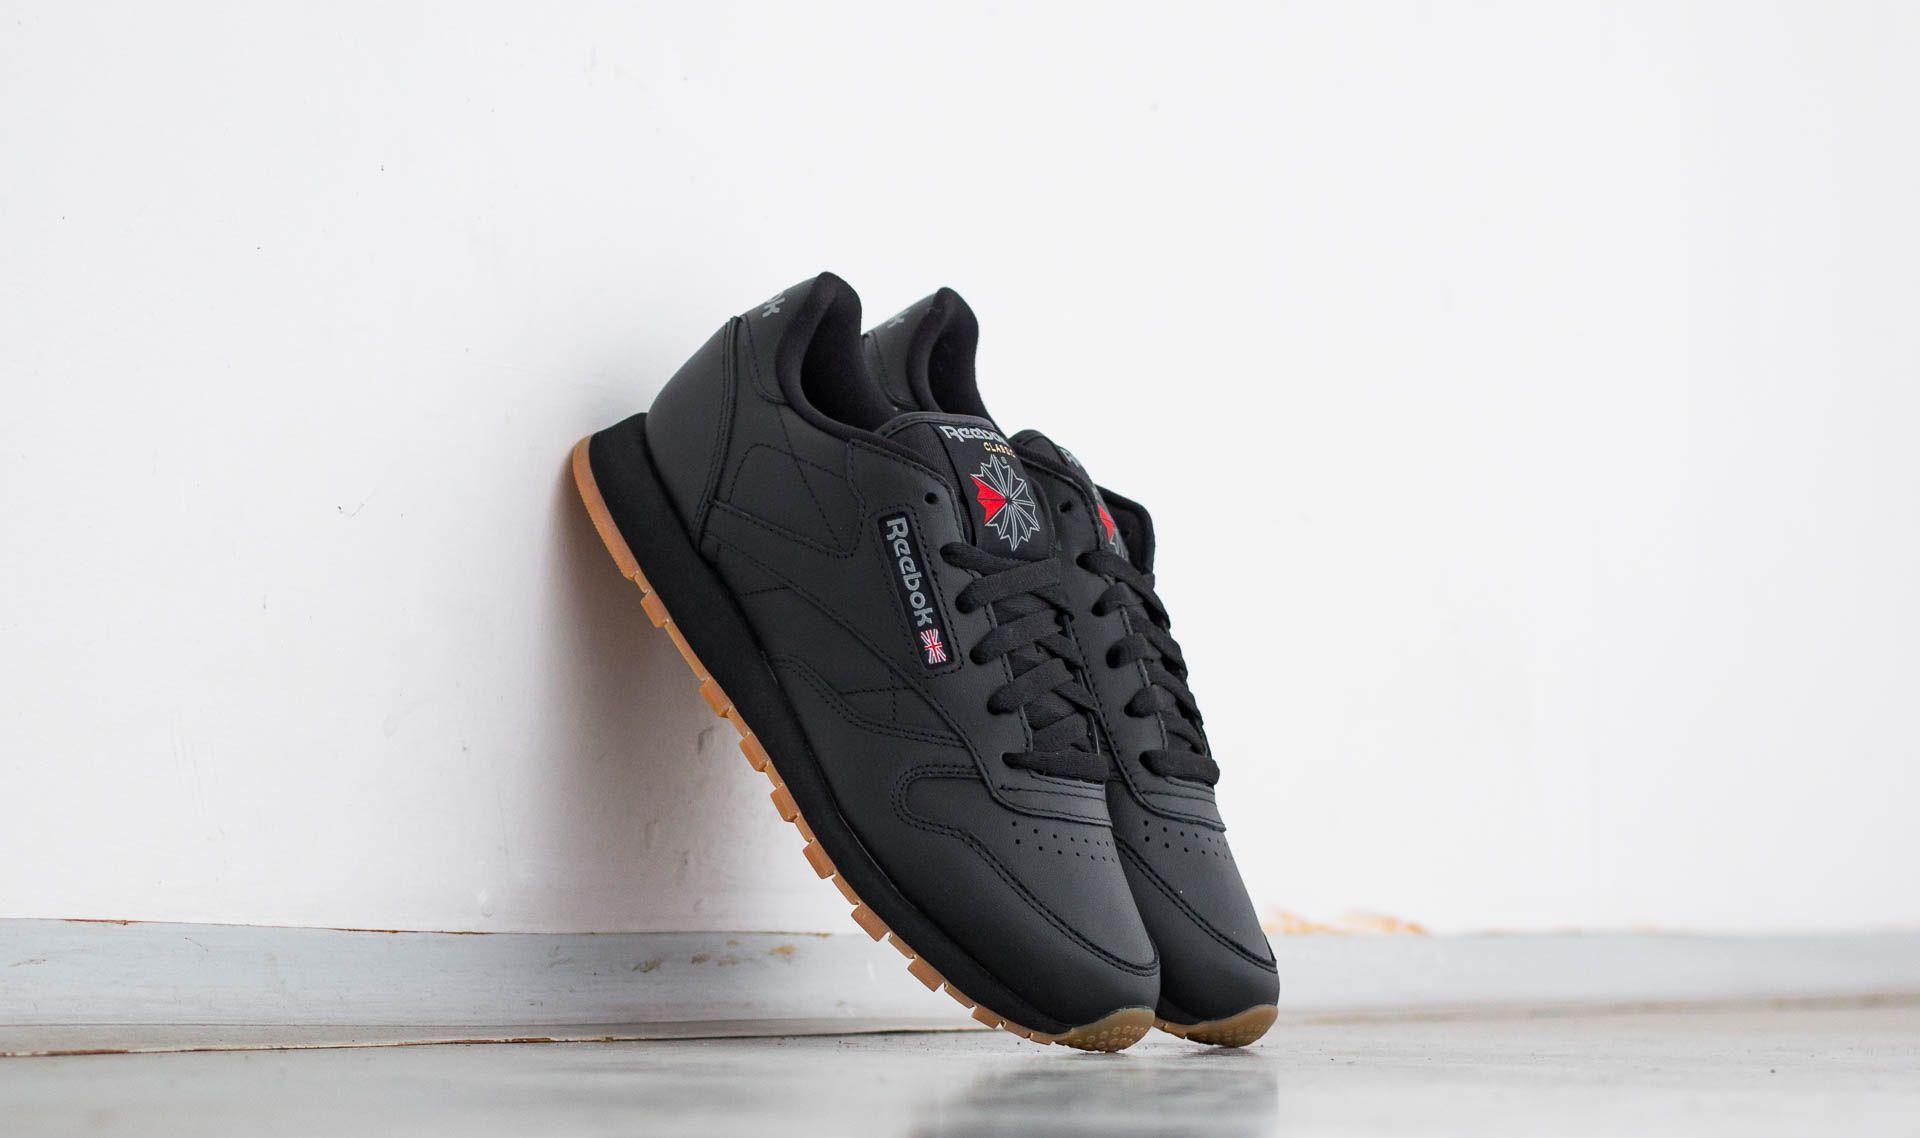 Reebok Classic Leather Black/ Gum 49804